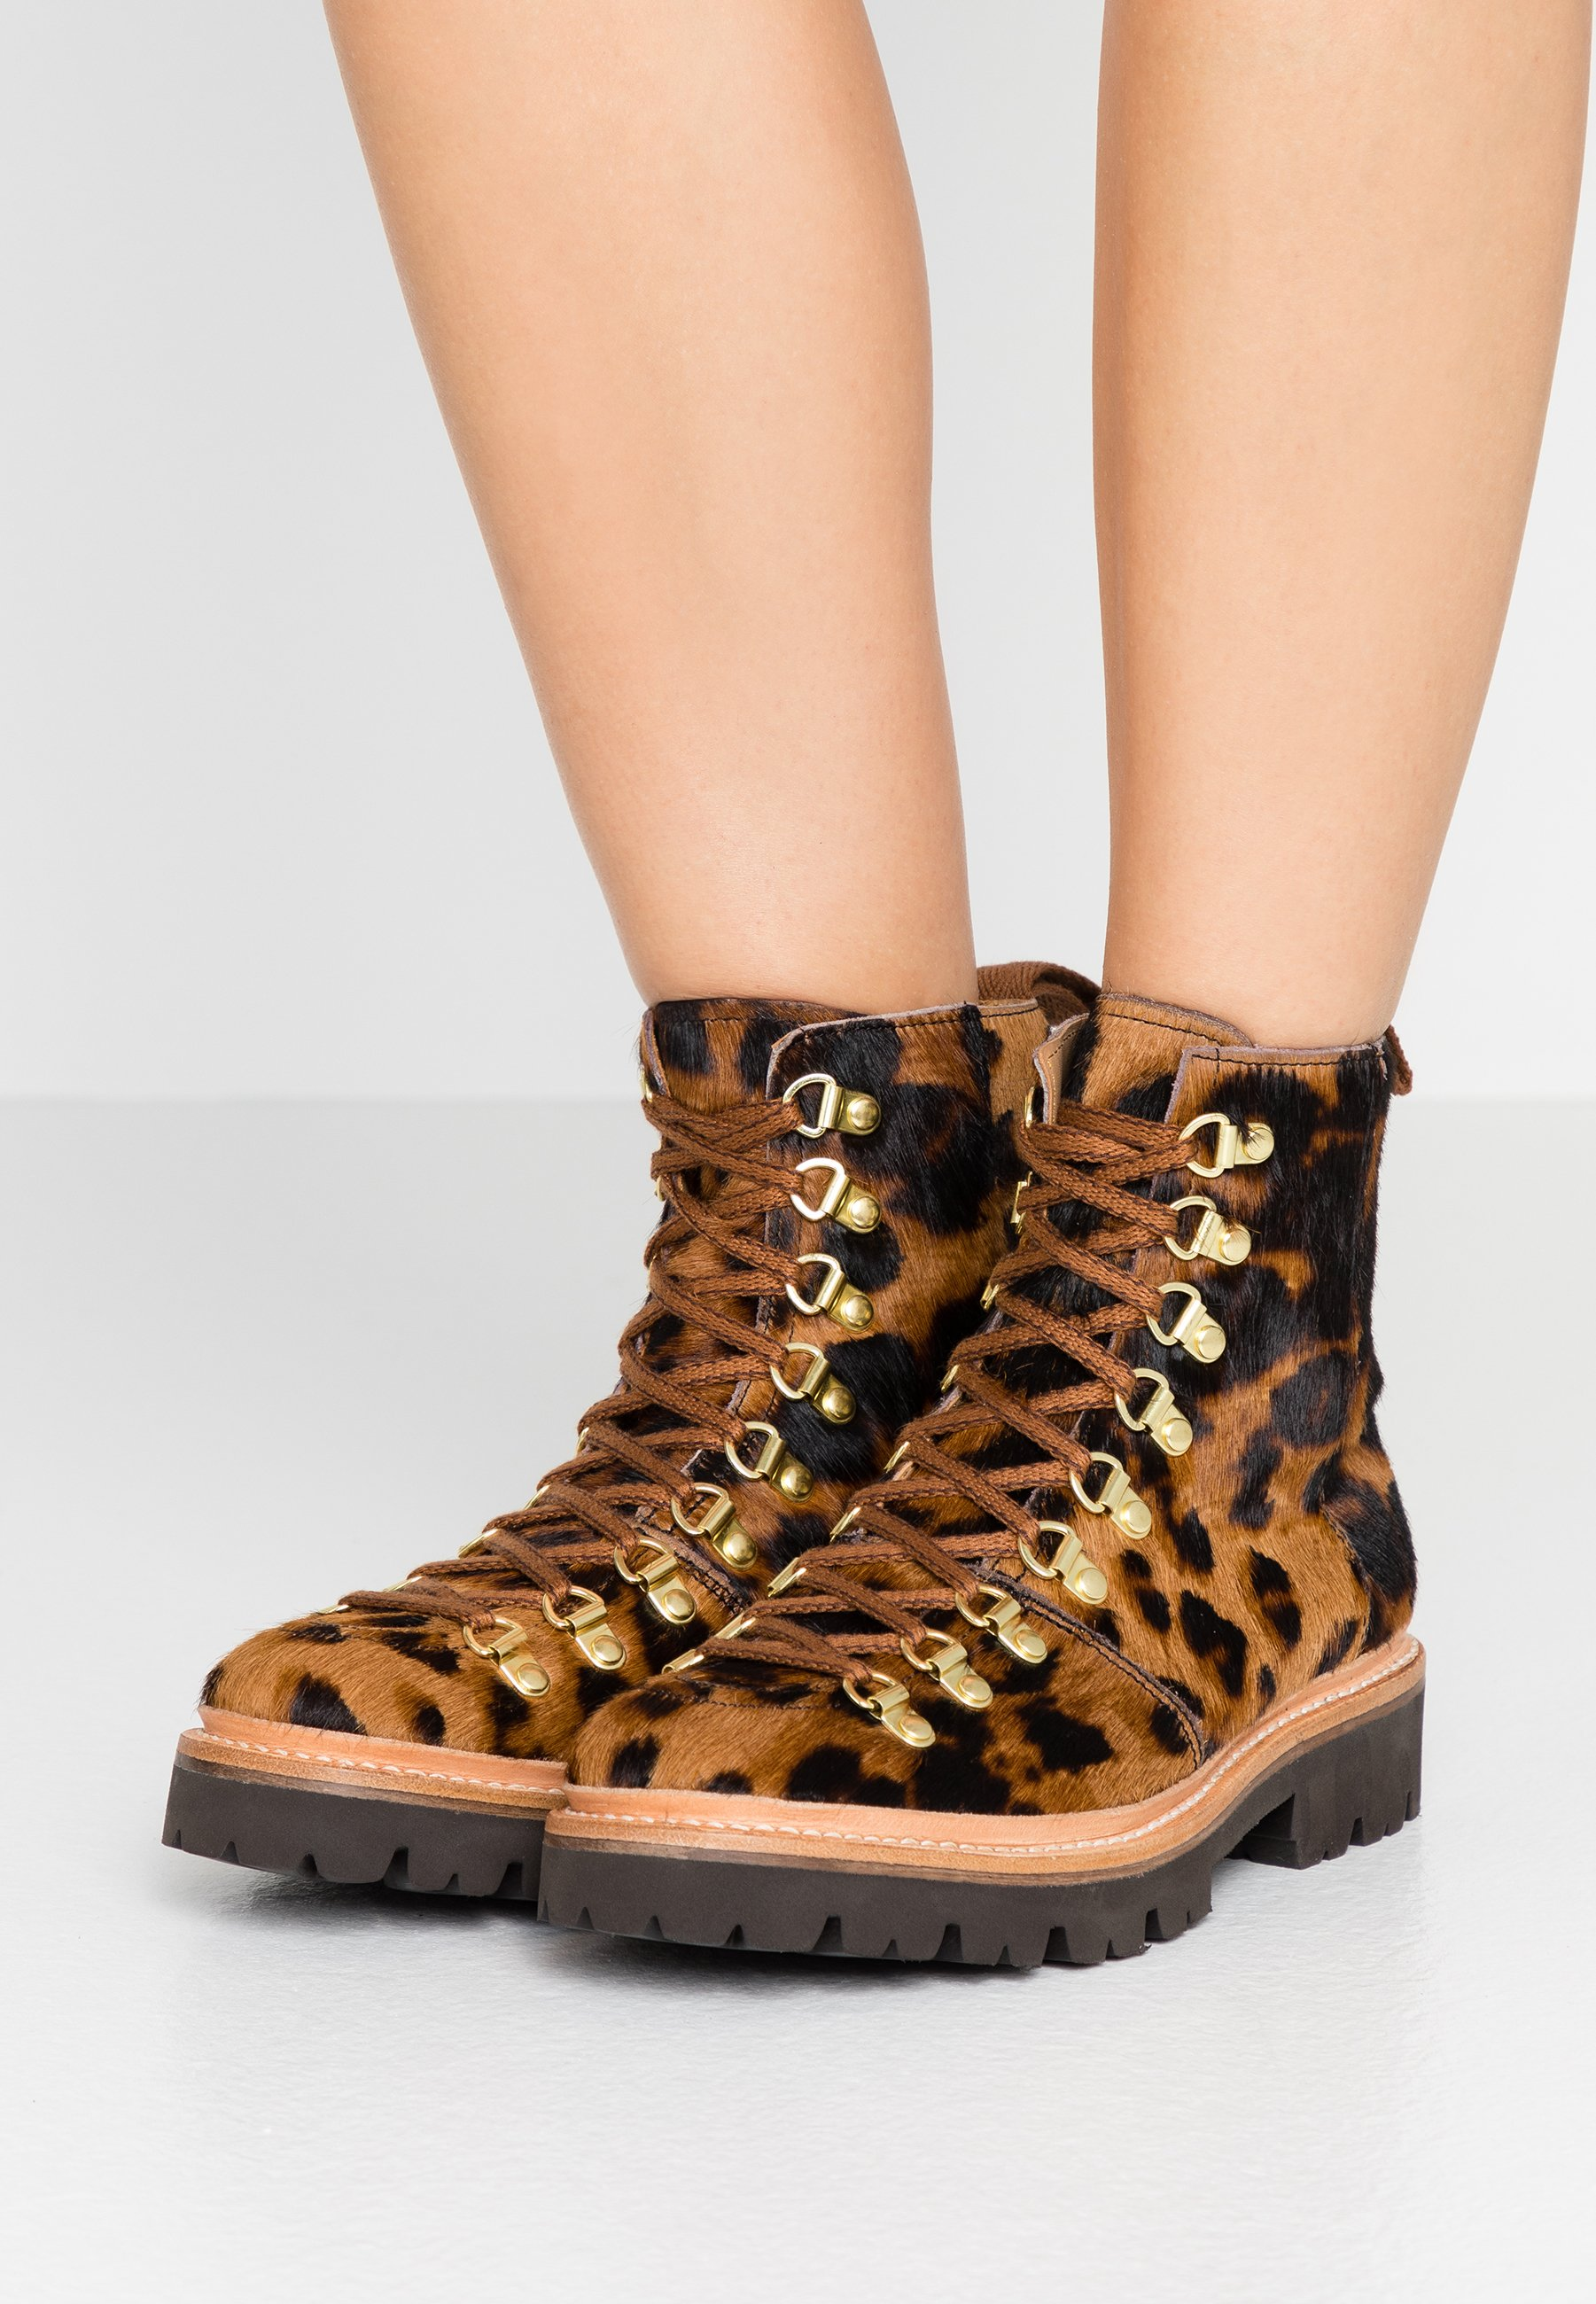 Best Price Cheapest Grenson NANETTE - Ankle boots - beige | women's shoes 2020 GfGvJ